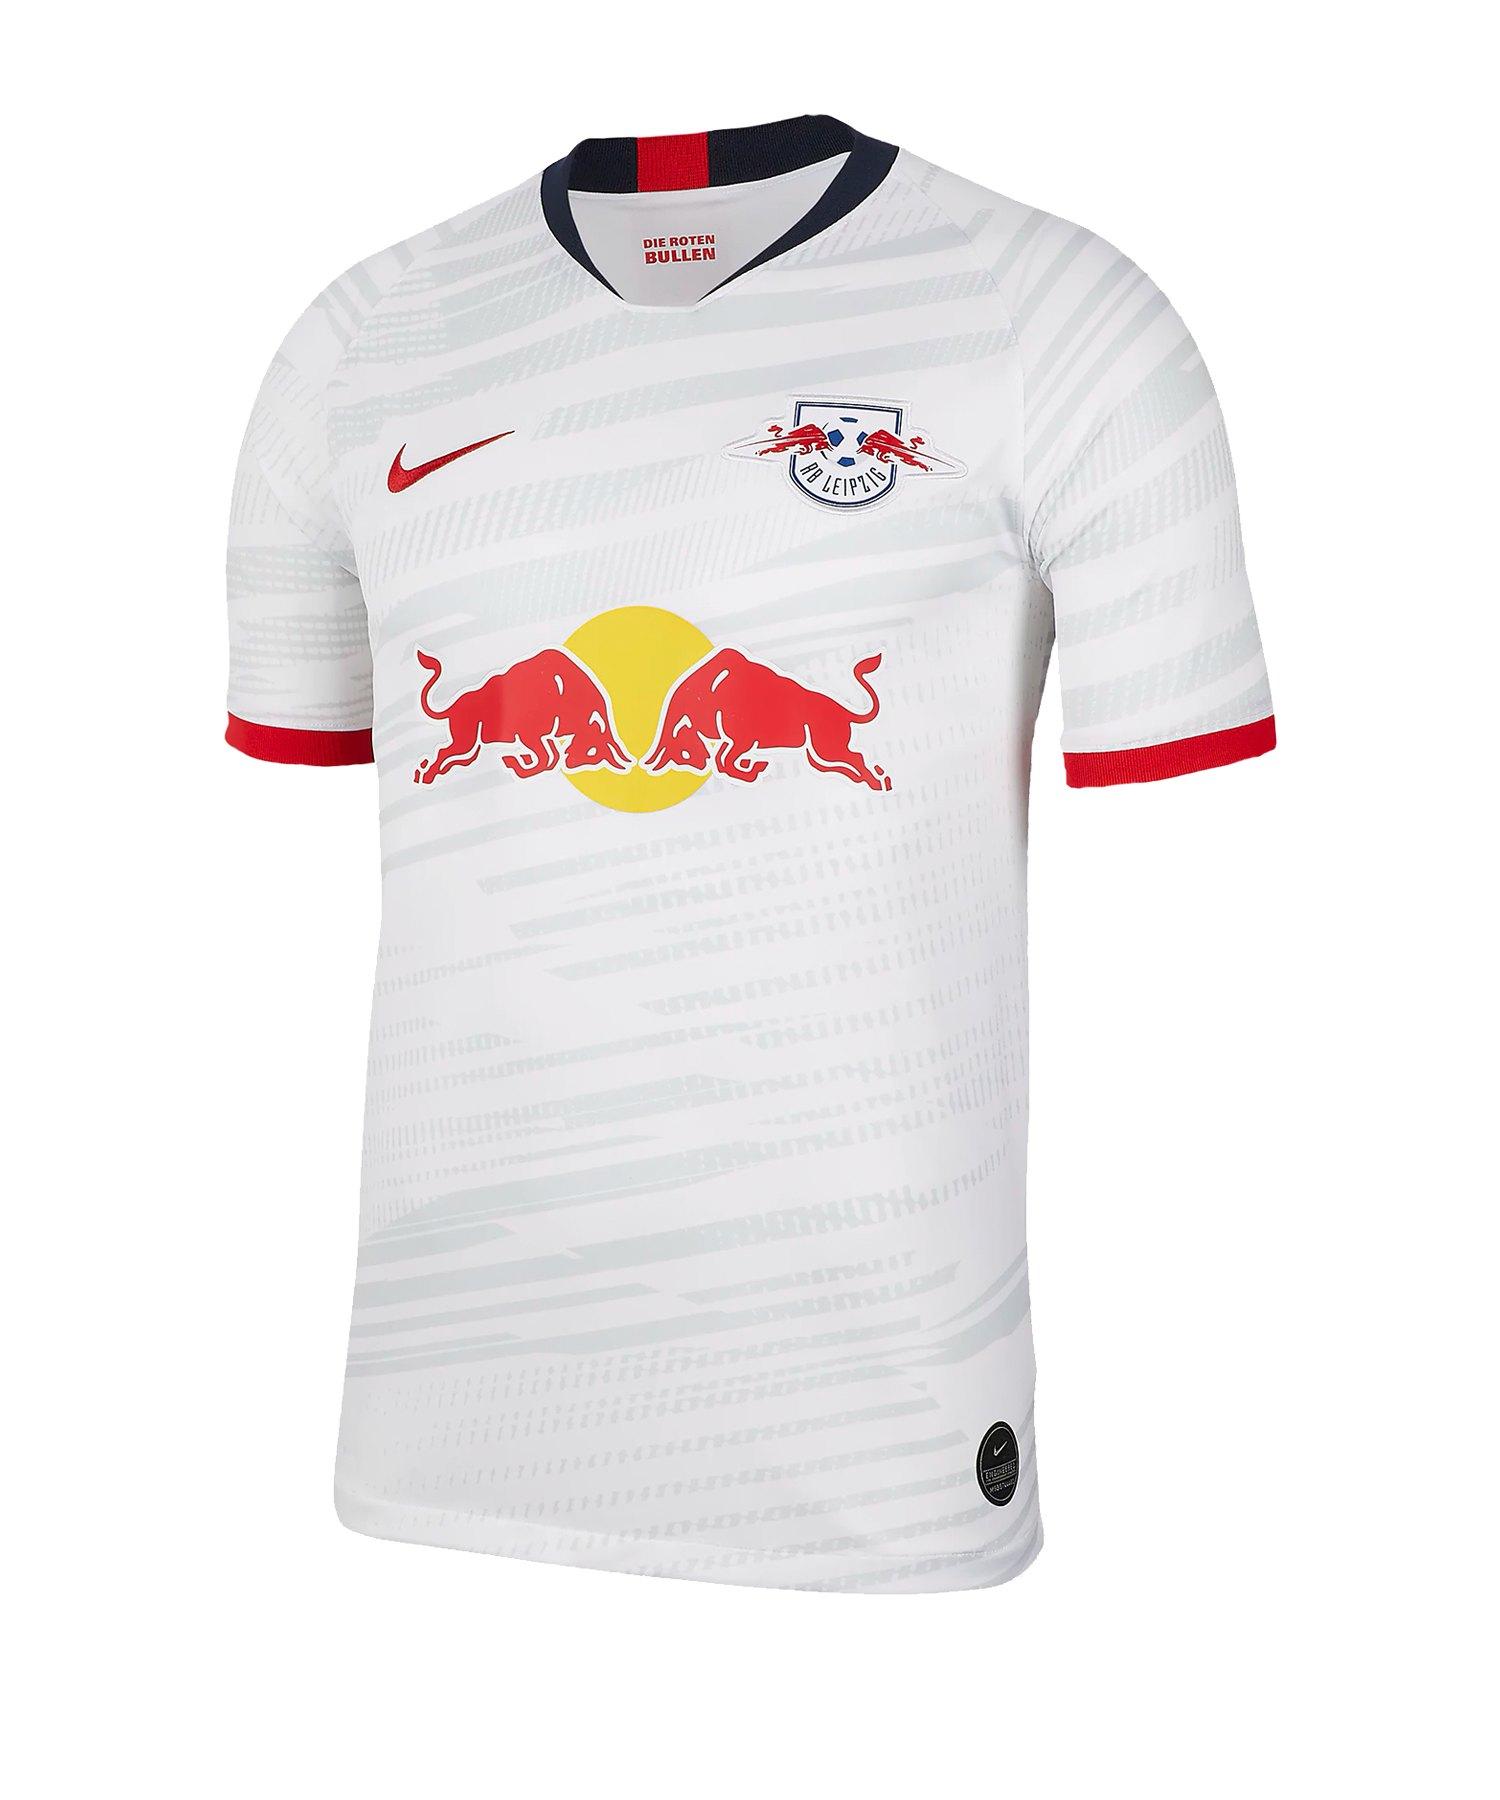 Nike RB Leipzig Trikot Home 2019/2020 Weiss F101 - weiss